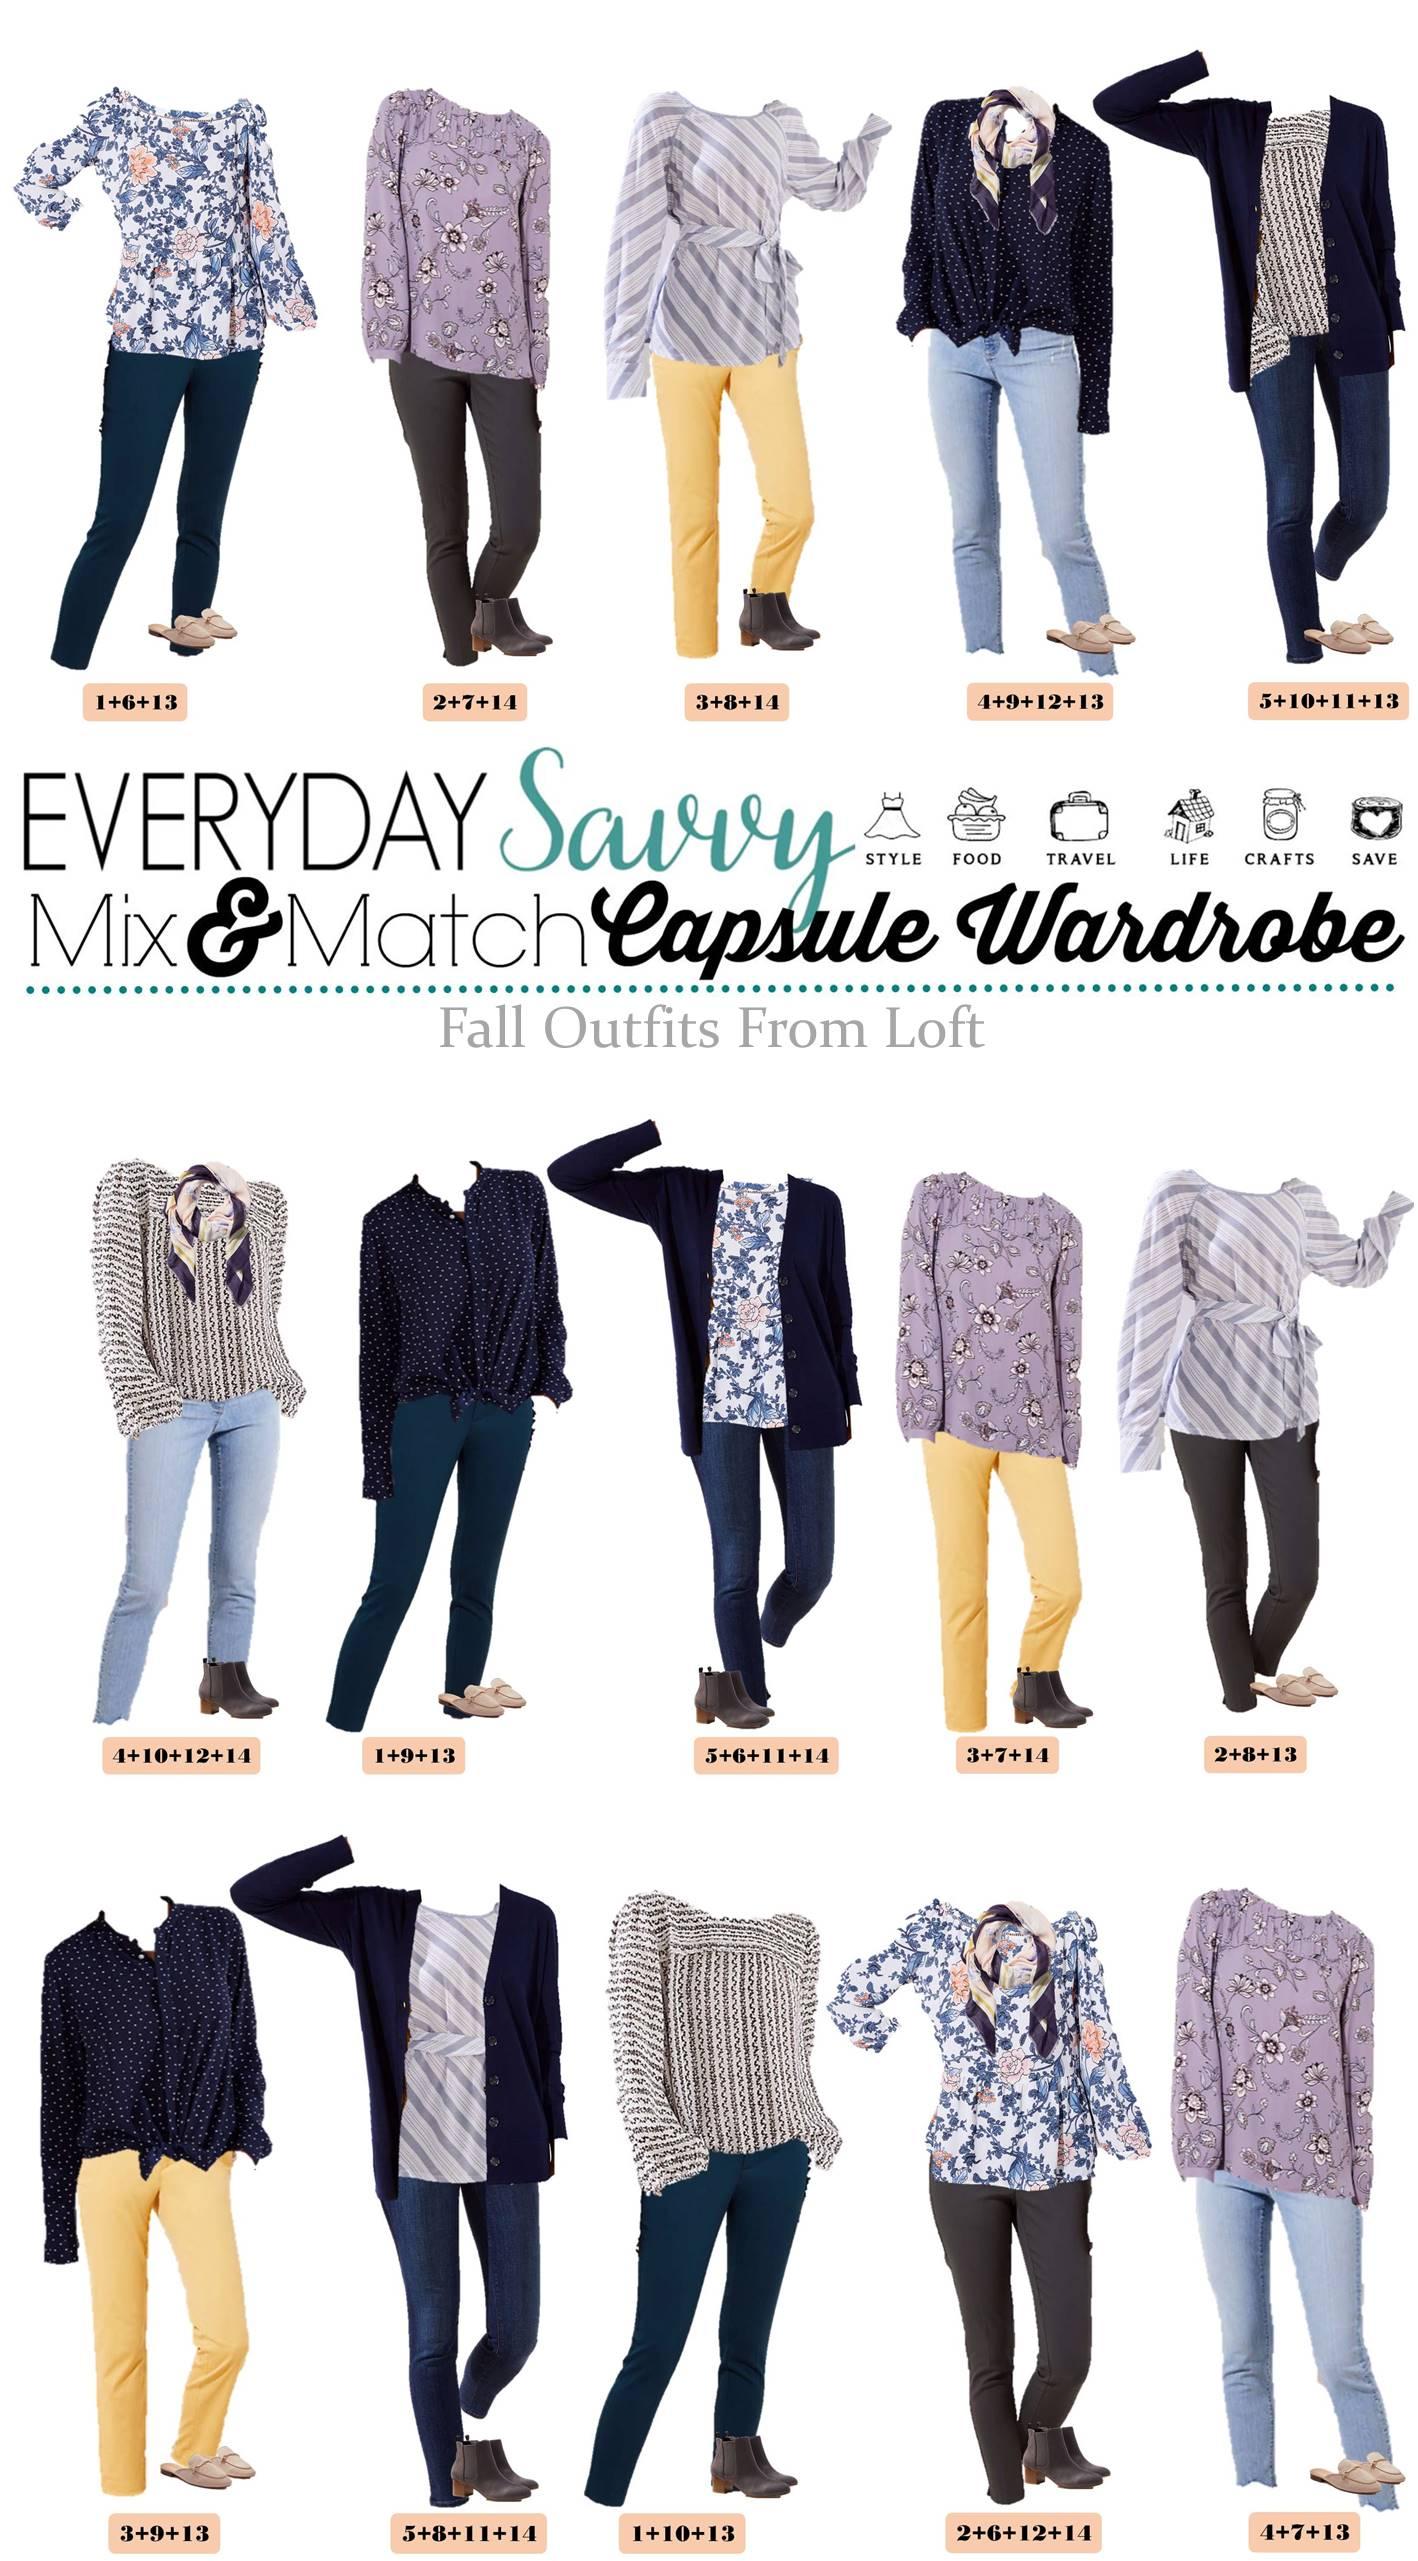 Loft Fall Capsule Wardrobe Fall Outfits For Women